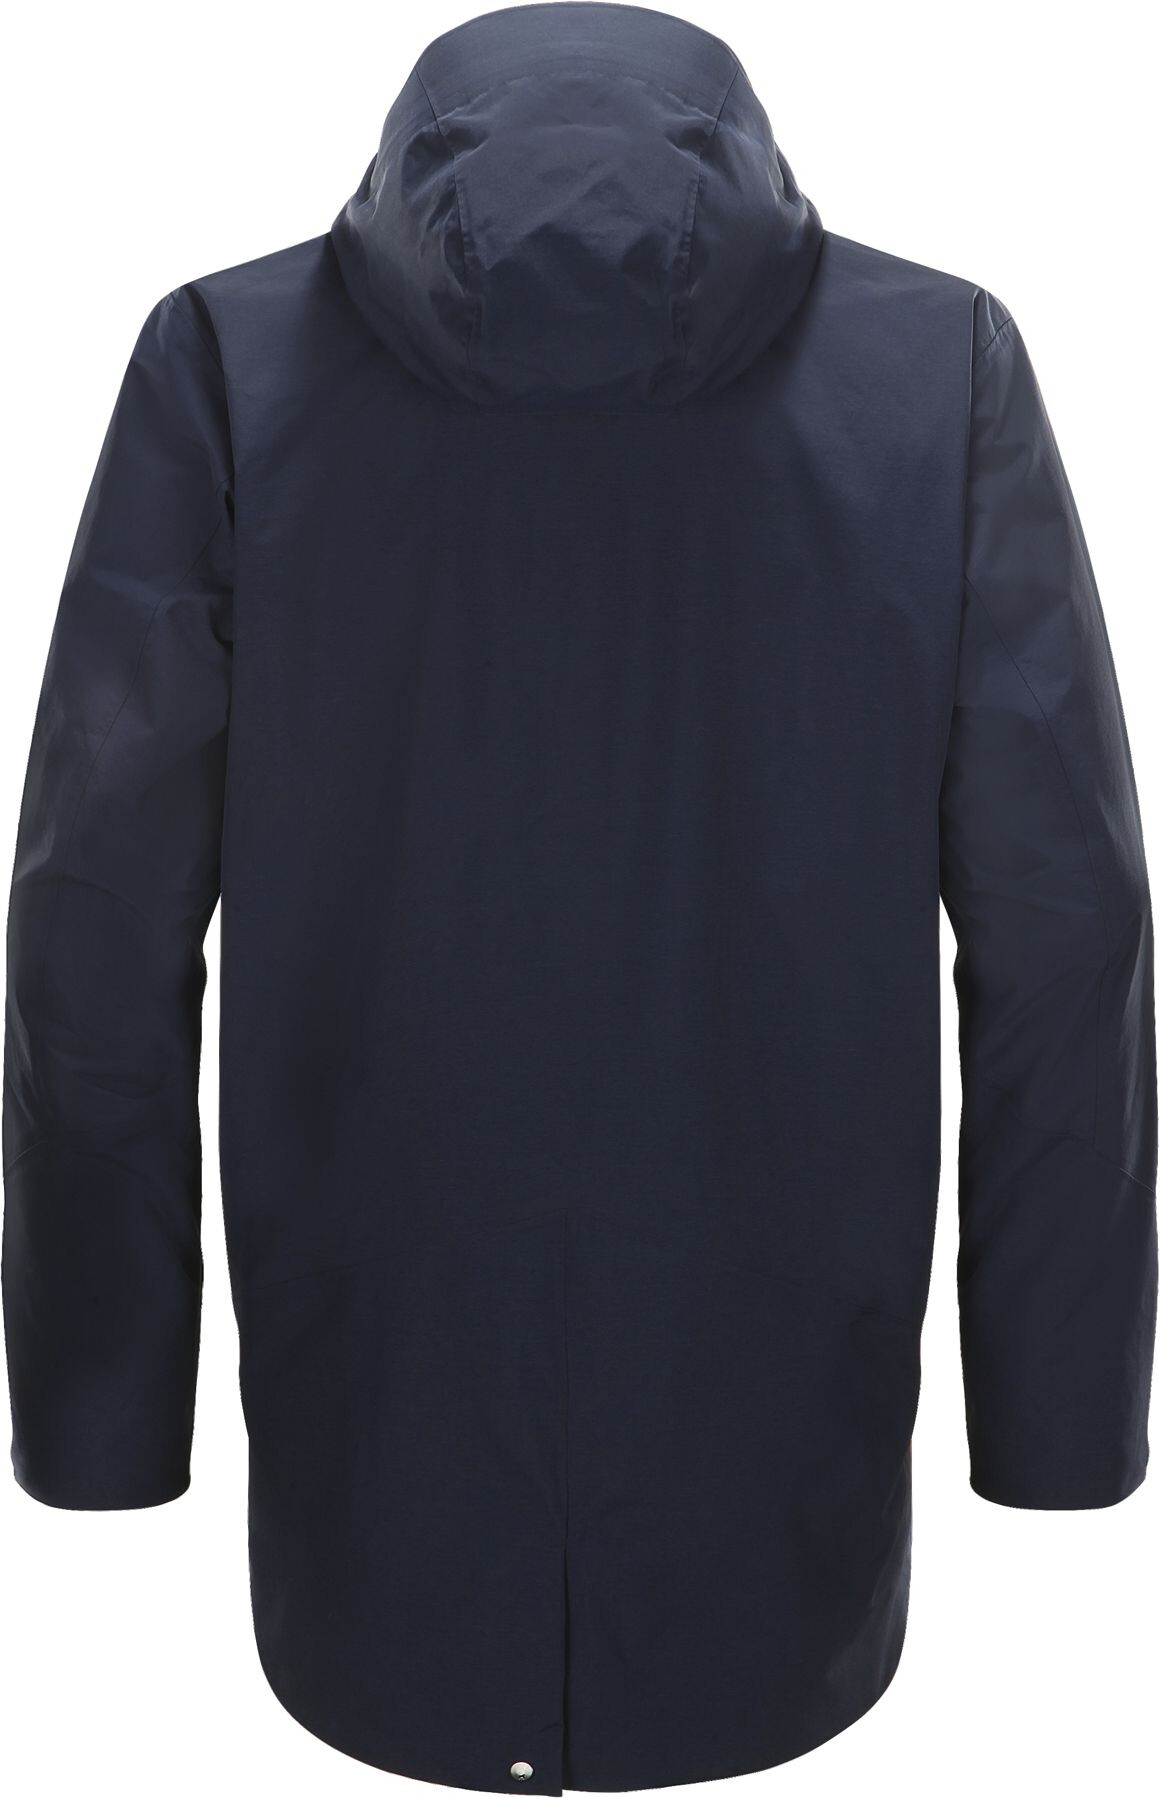 Haglöfs Torsång Jacket Men blue at Addnature.co.uk 53c171dabd